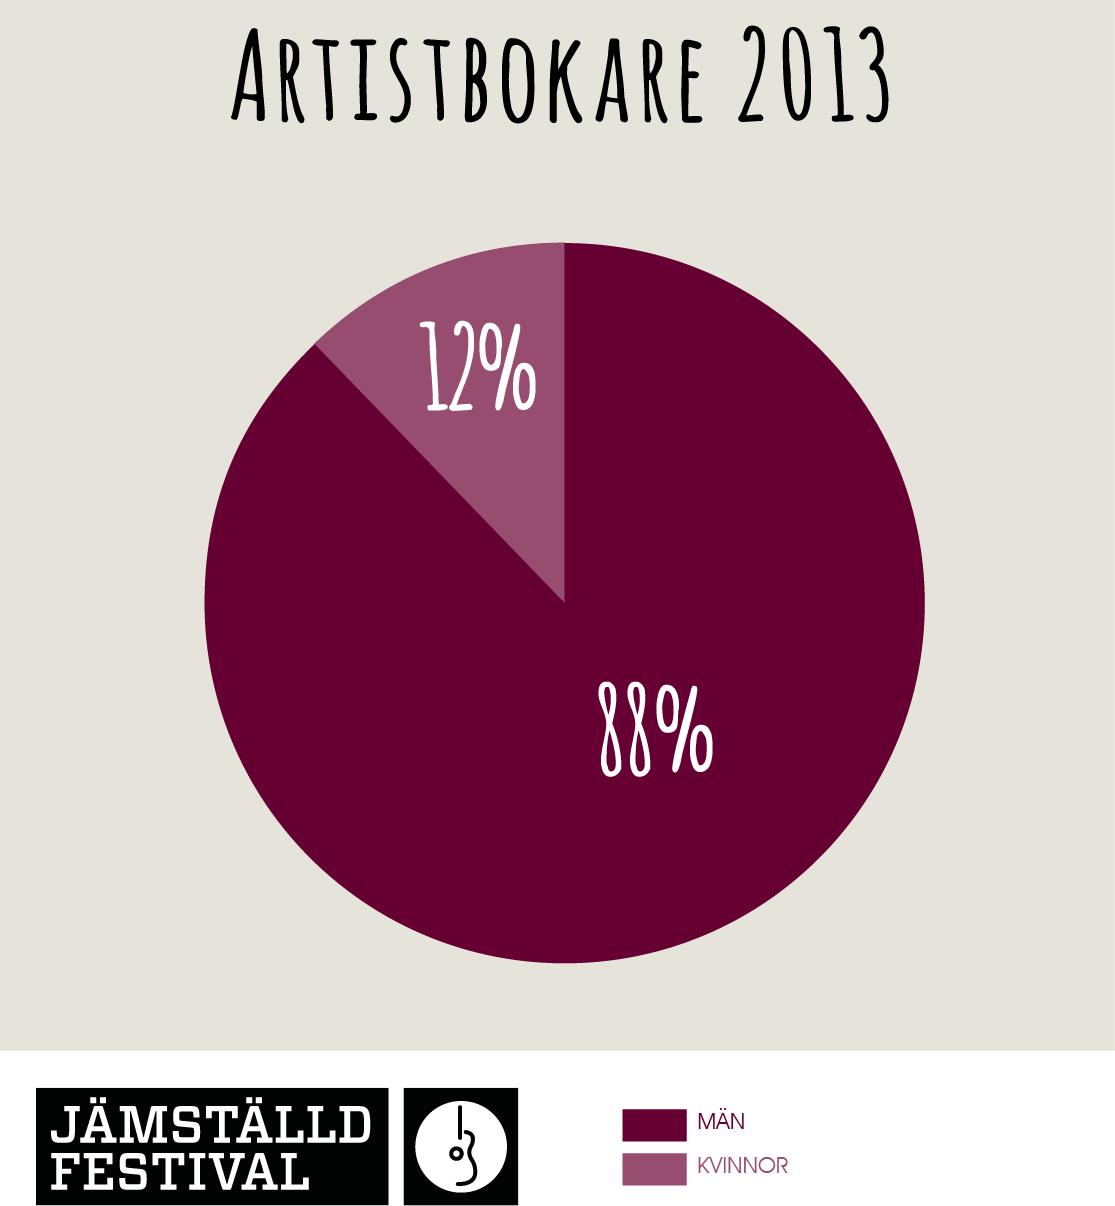 artistbokare 2013